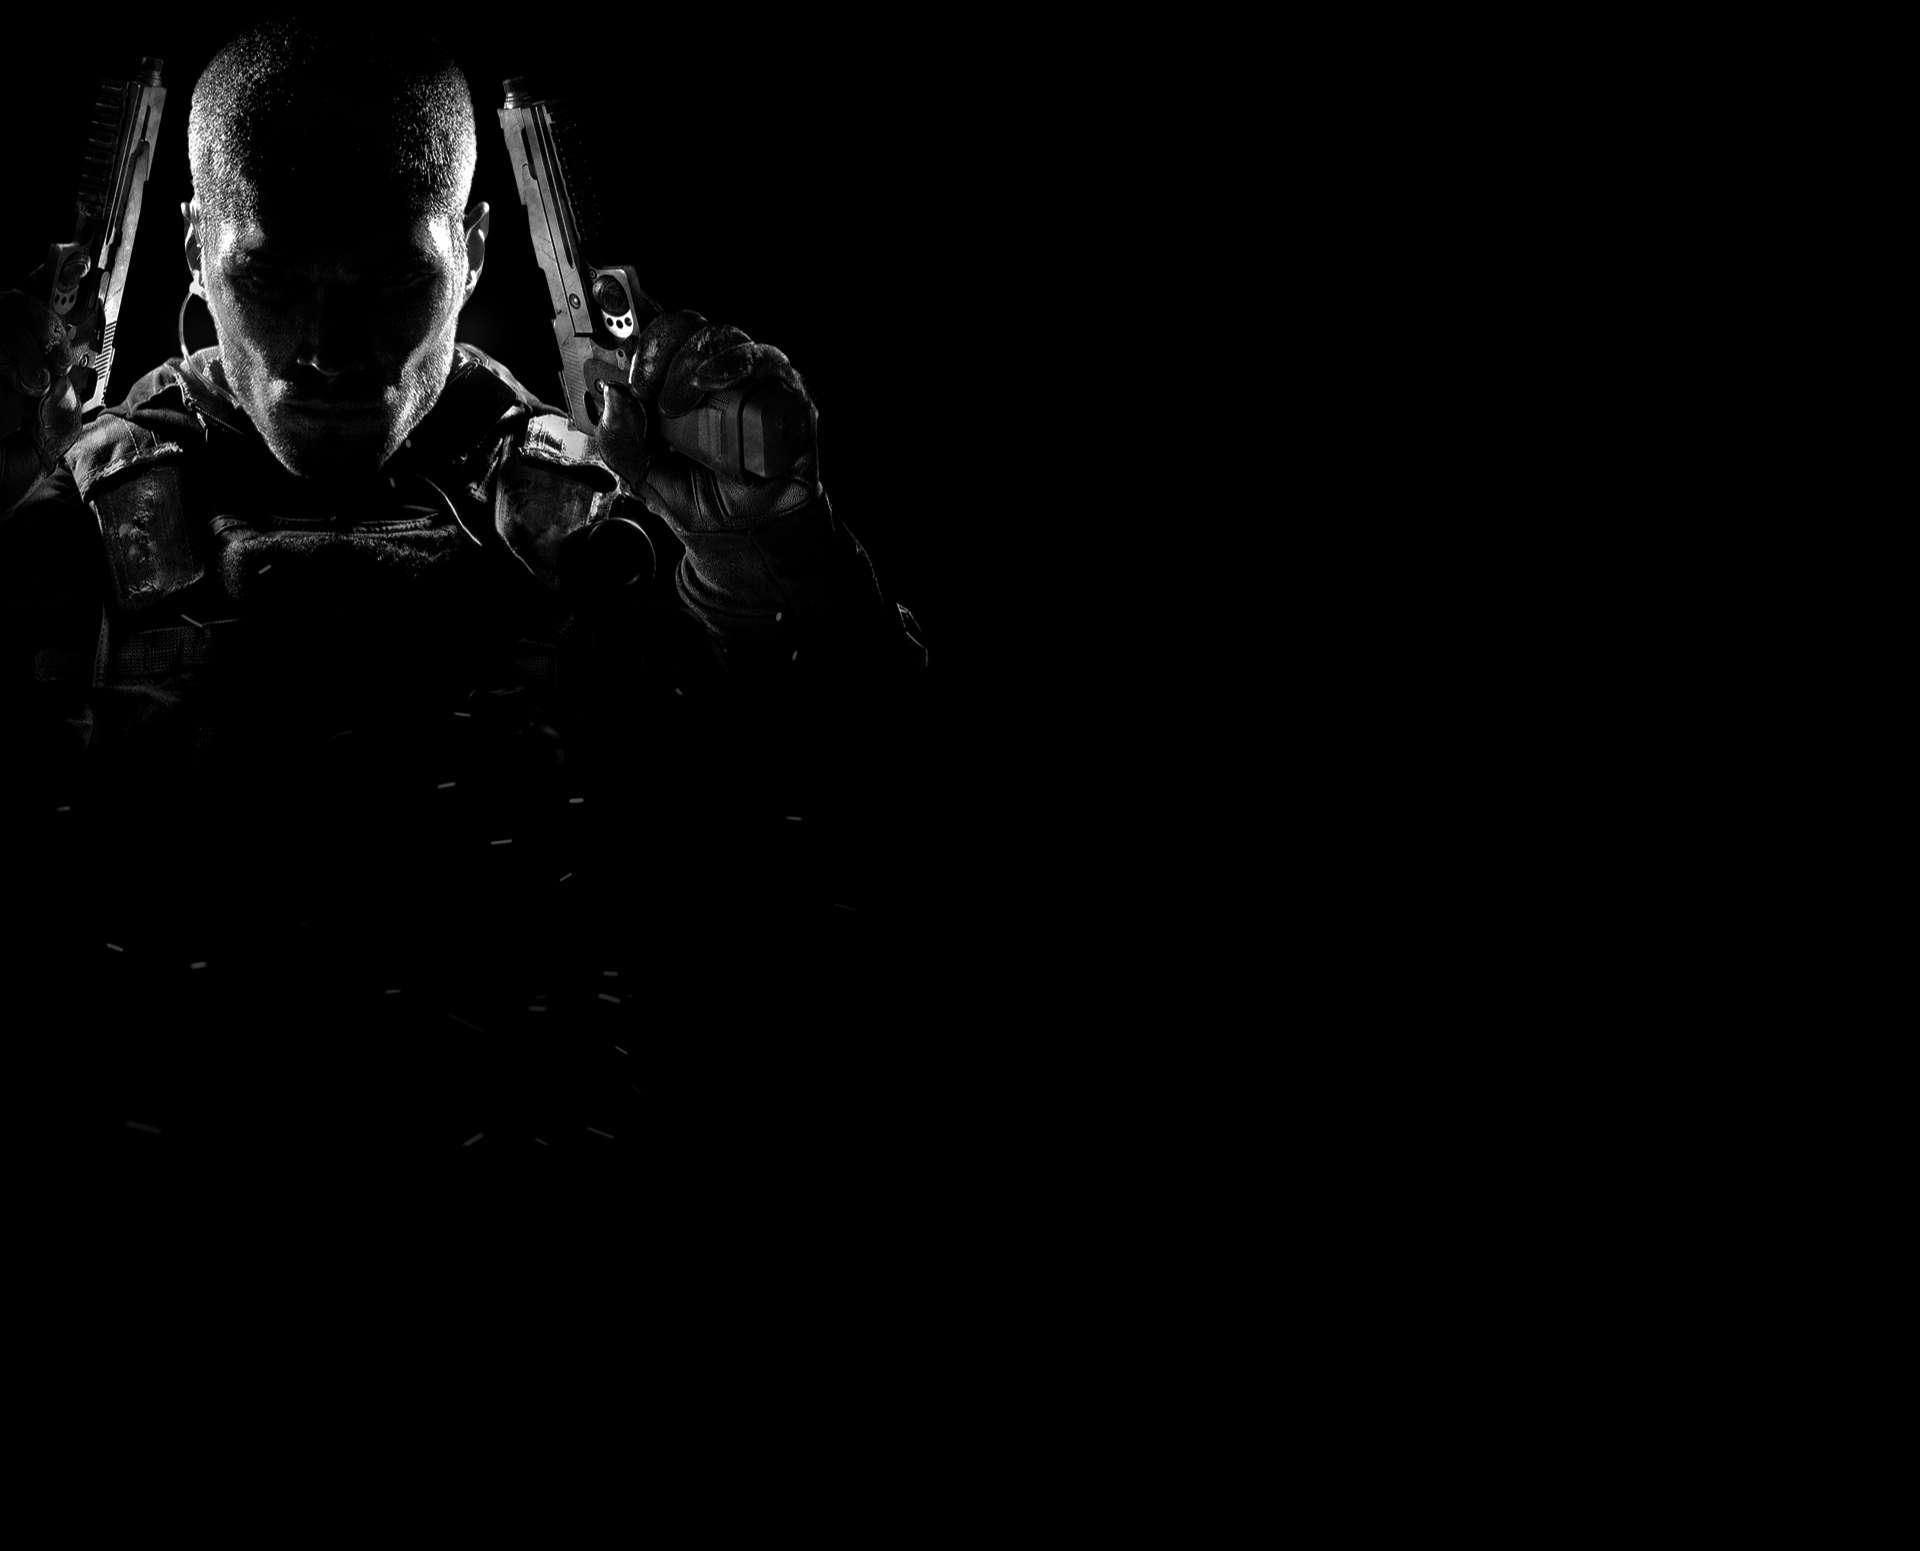 Call of Duty Wallpaper 027